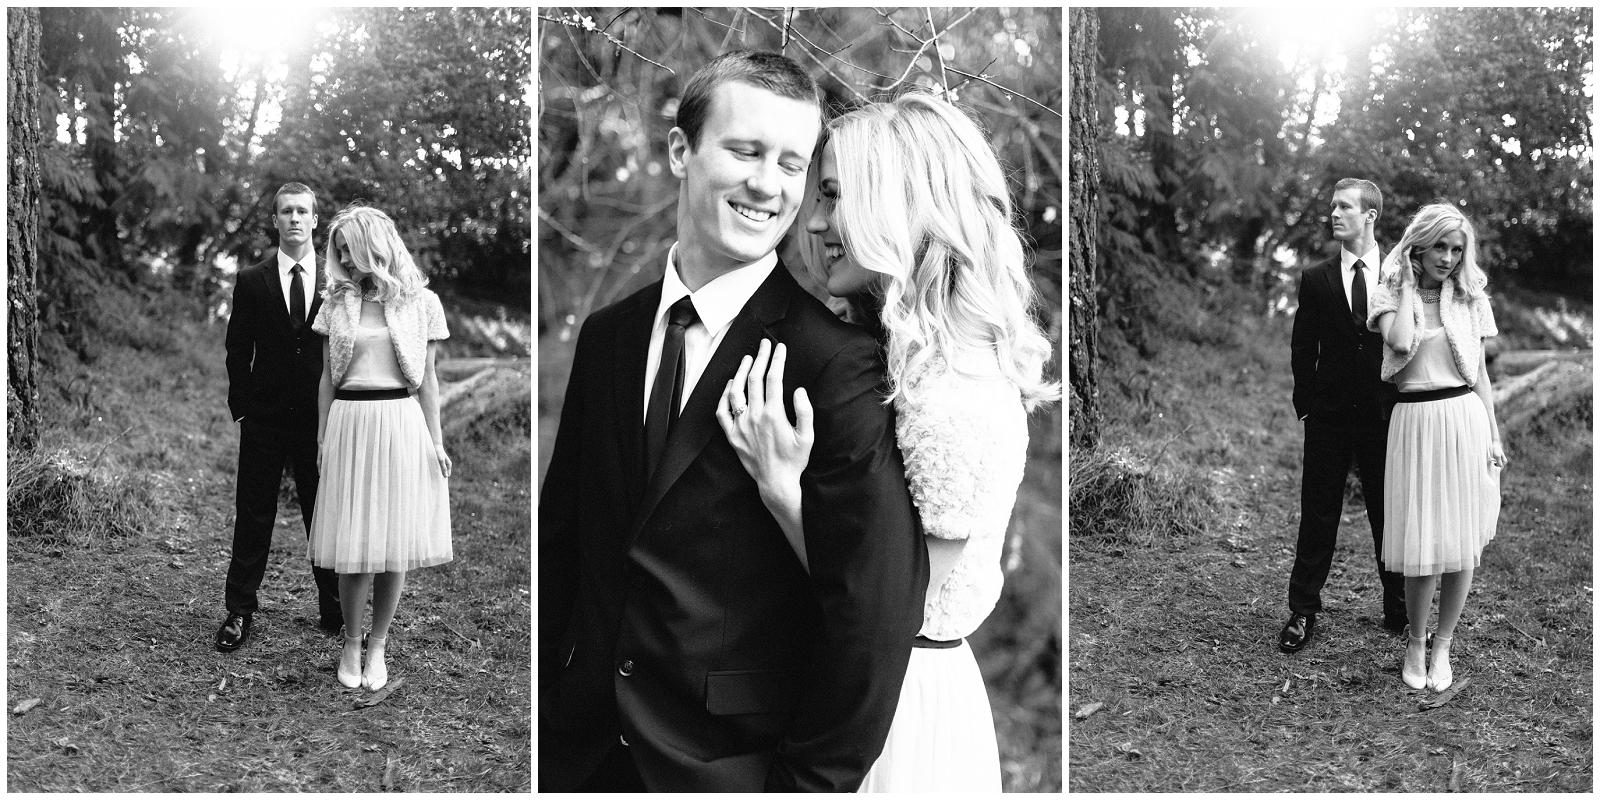 San-Francisco-Bay-Area-Wedding-Photography-Engagement-Redwoods-2.jpg